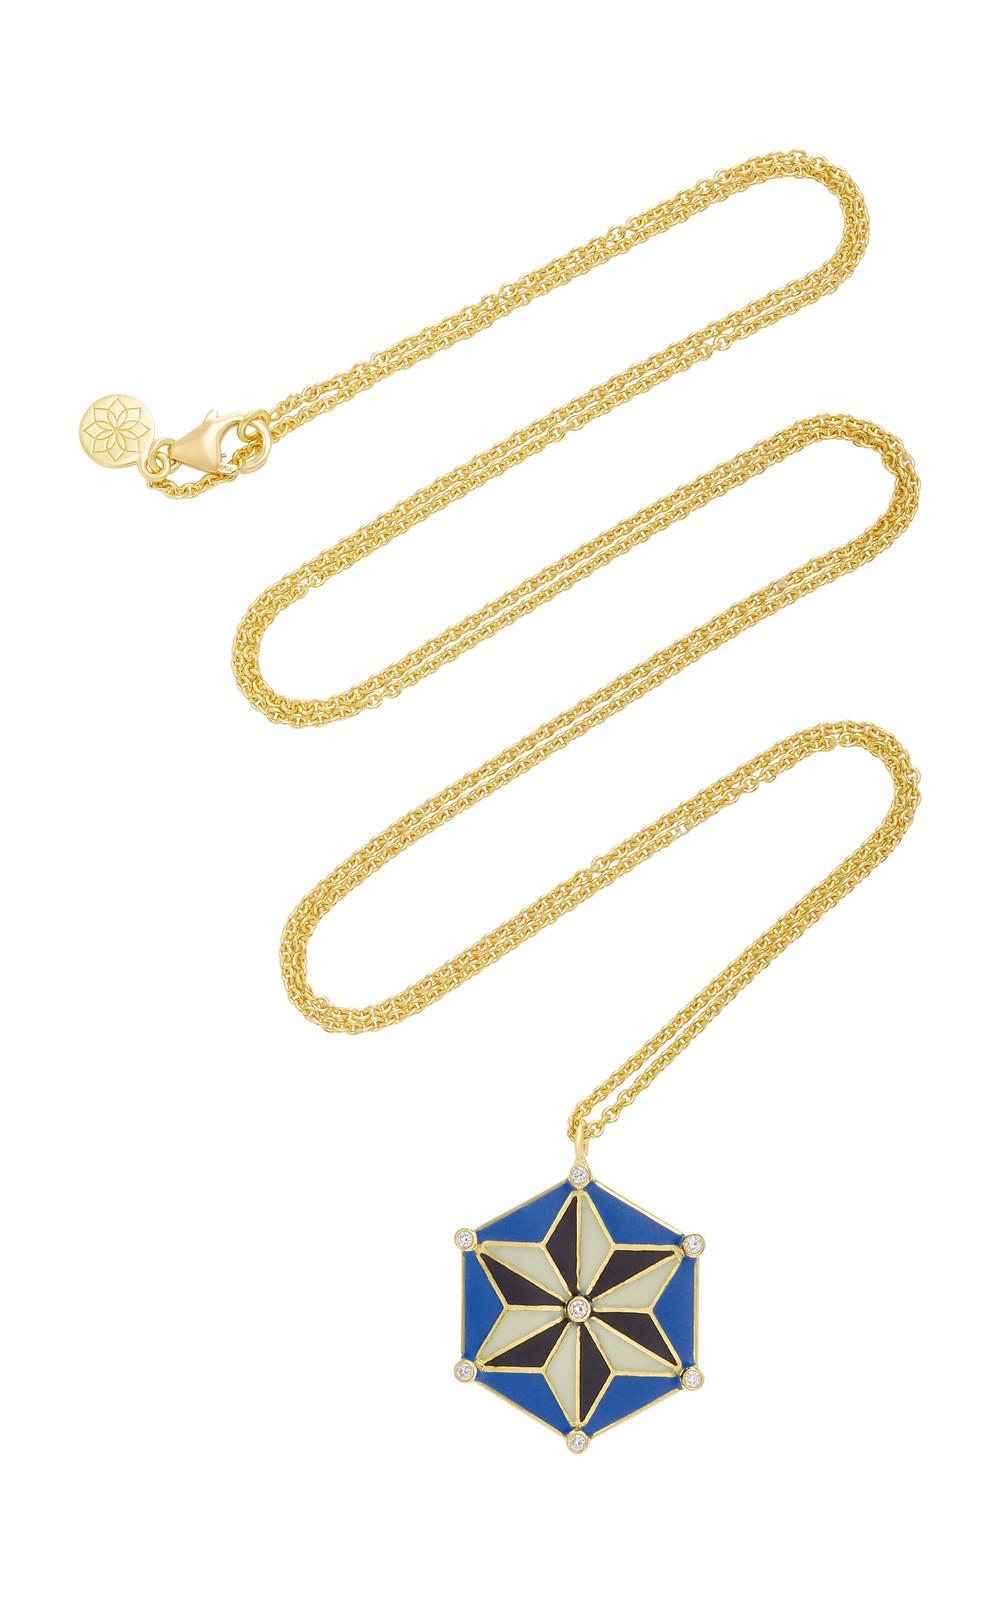 Amrapali 18K Gold and Enamel Star Necklace in black